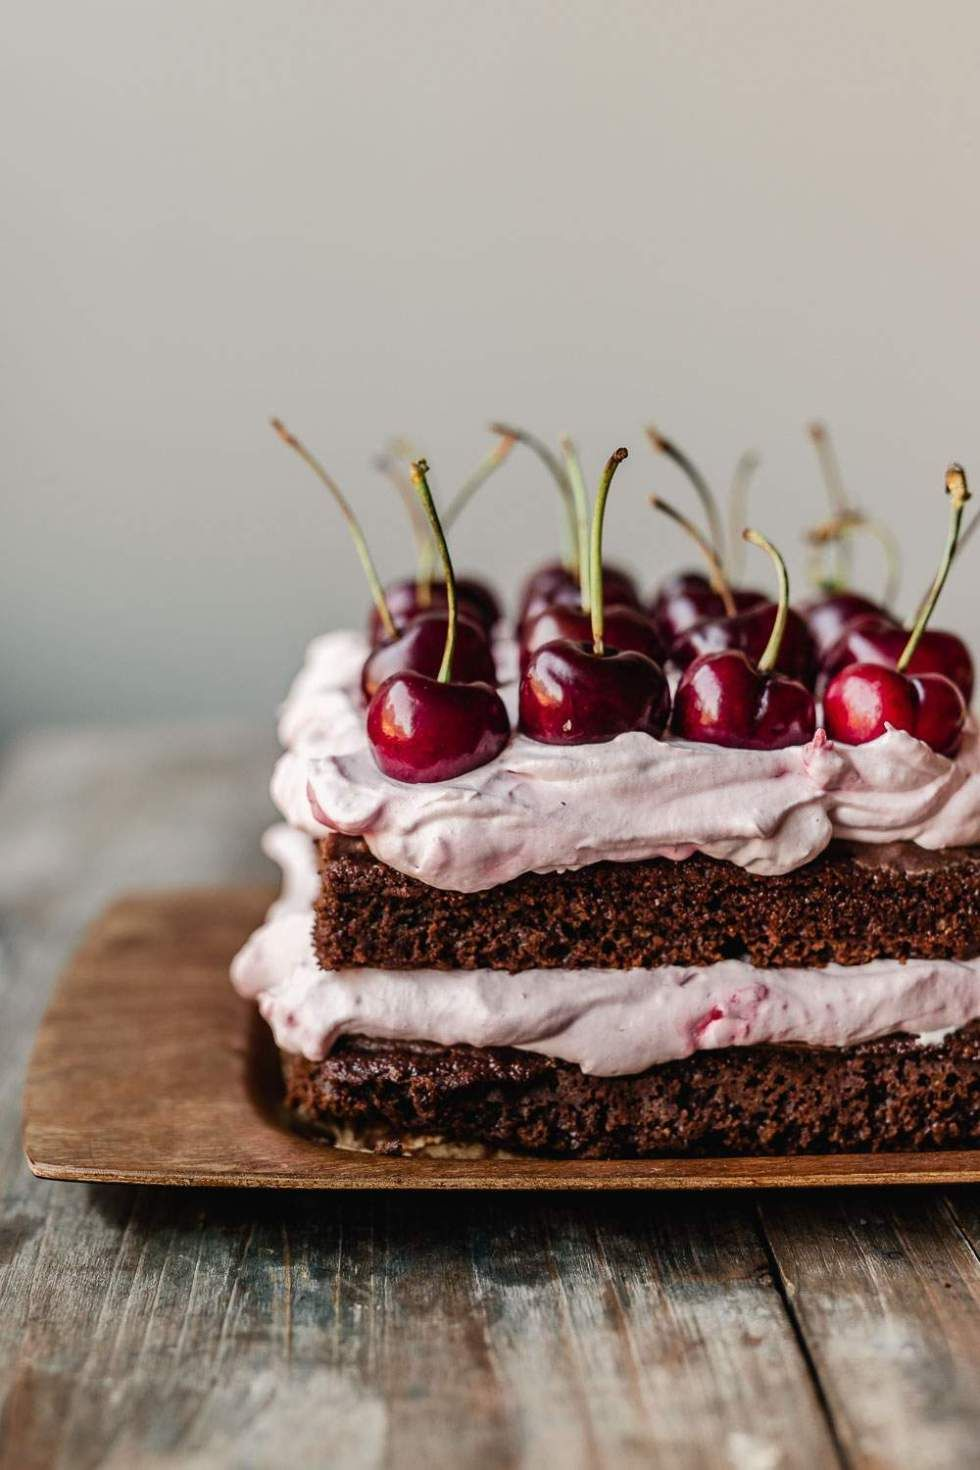 VEGAN BLACK FOREST CHERRY CREAM CAKE – My Berry Forest